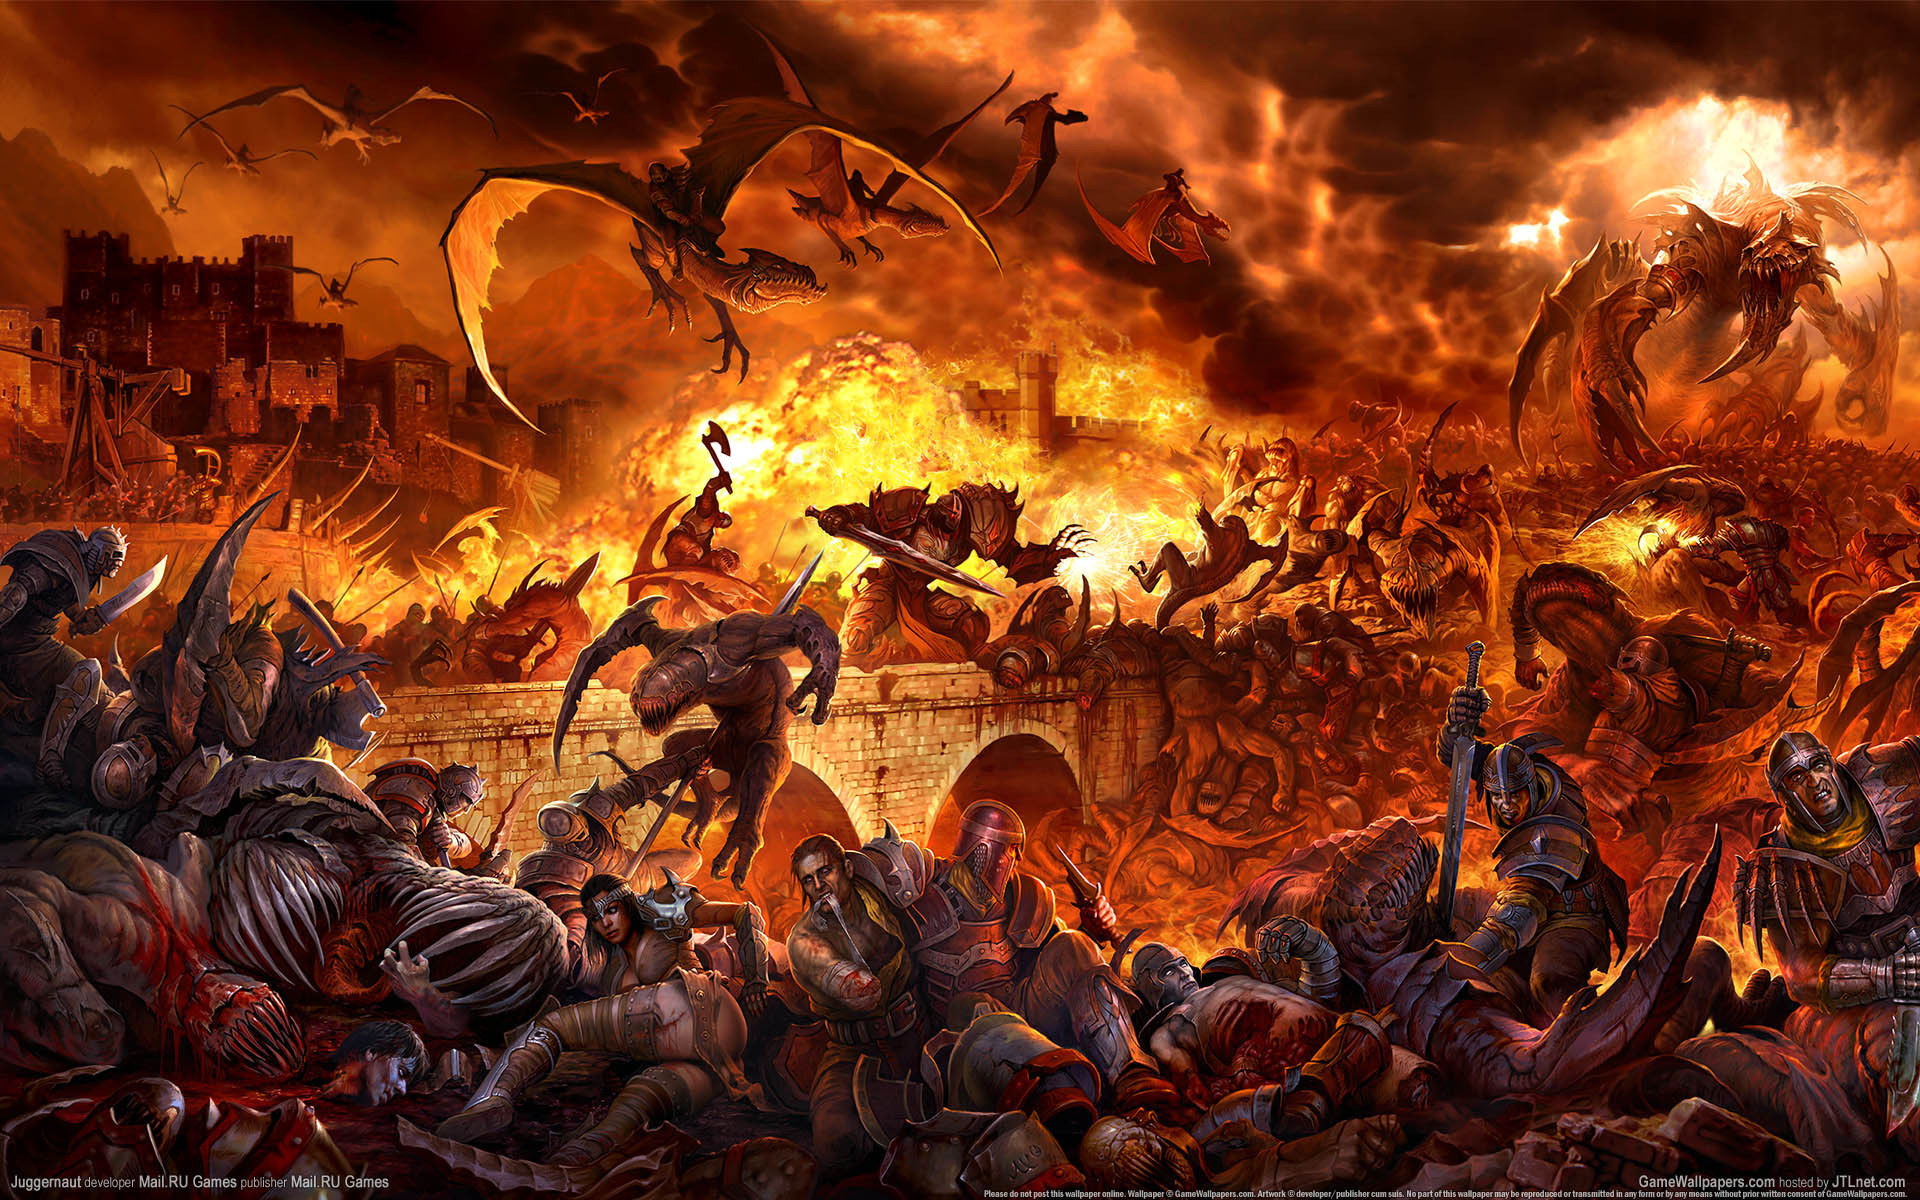 572714-epic-fantasy-war-wallpaper-1920x1200-for-pc.jpg